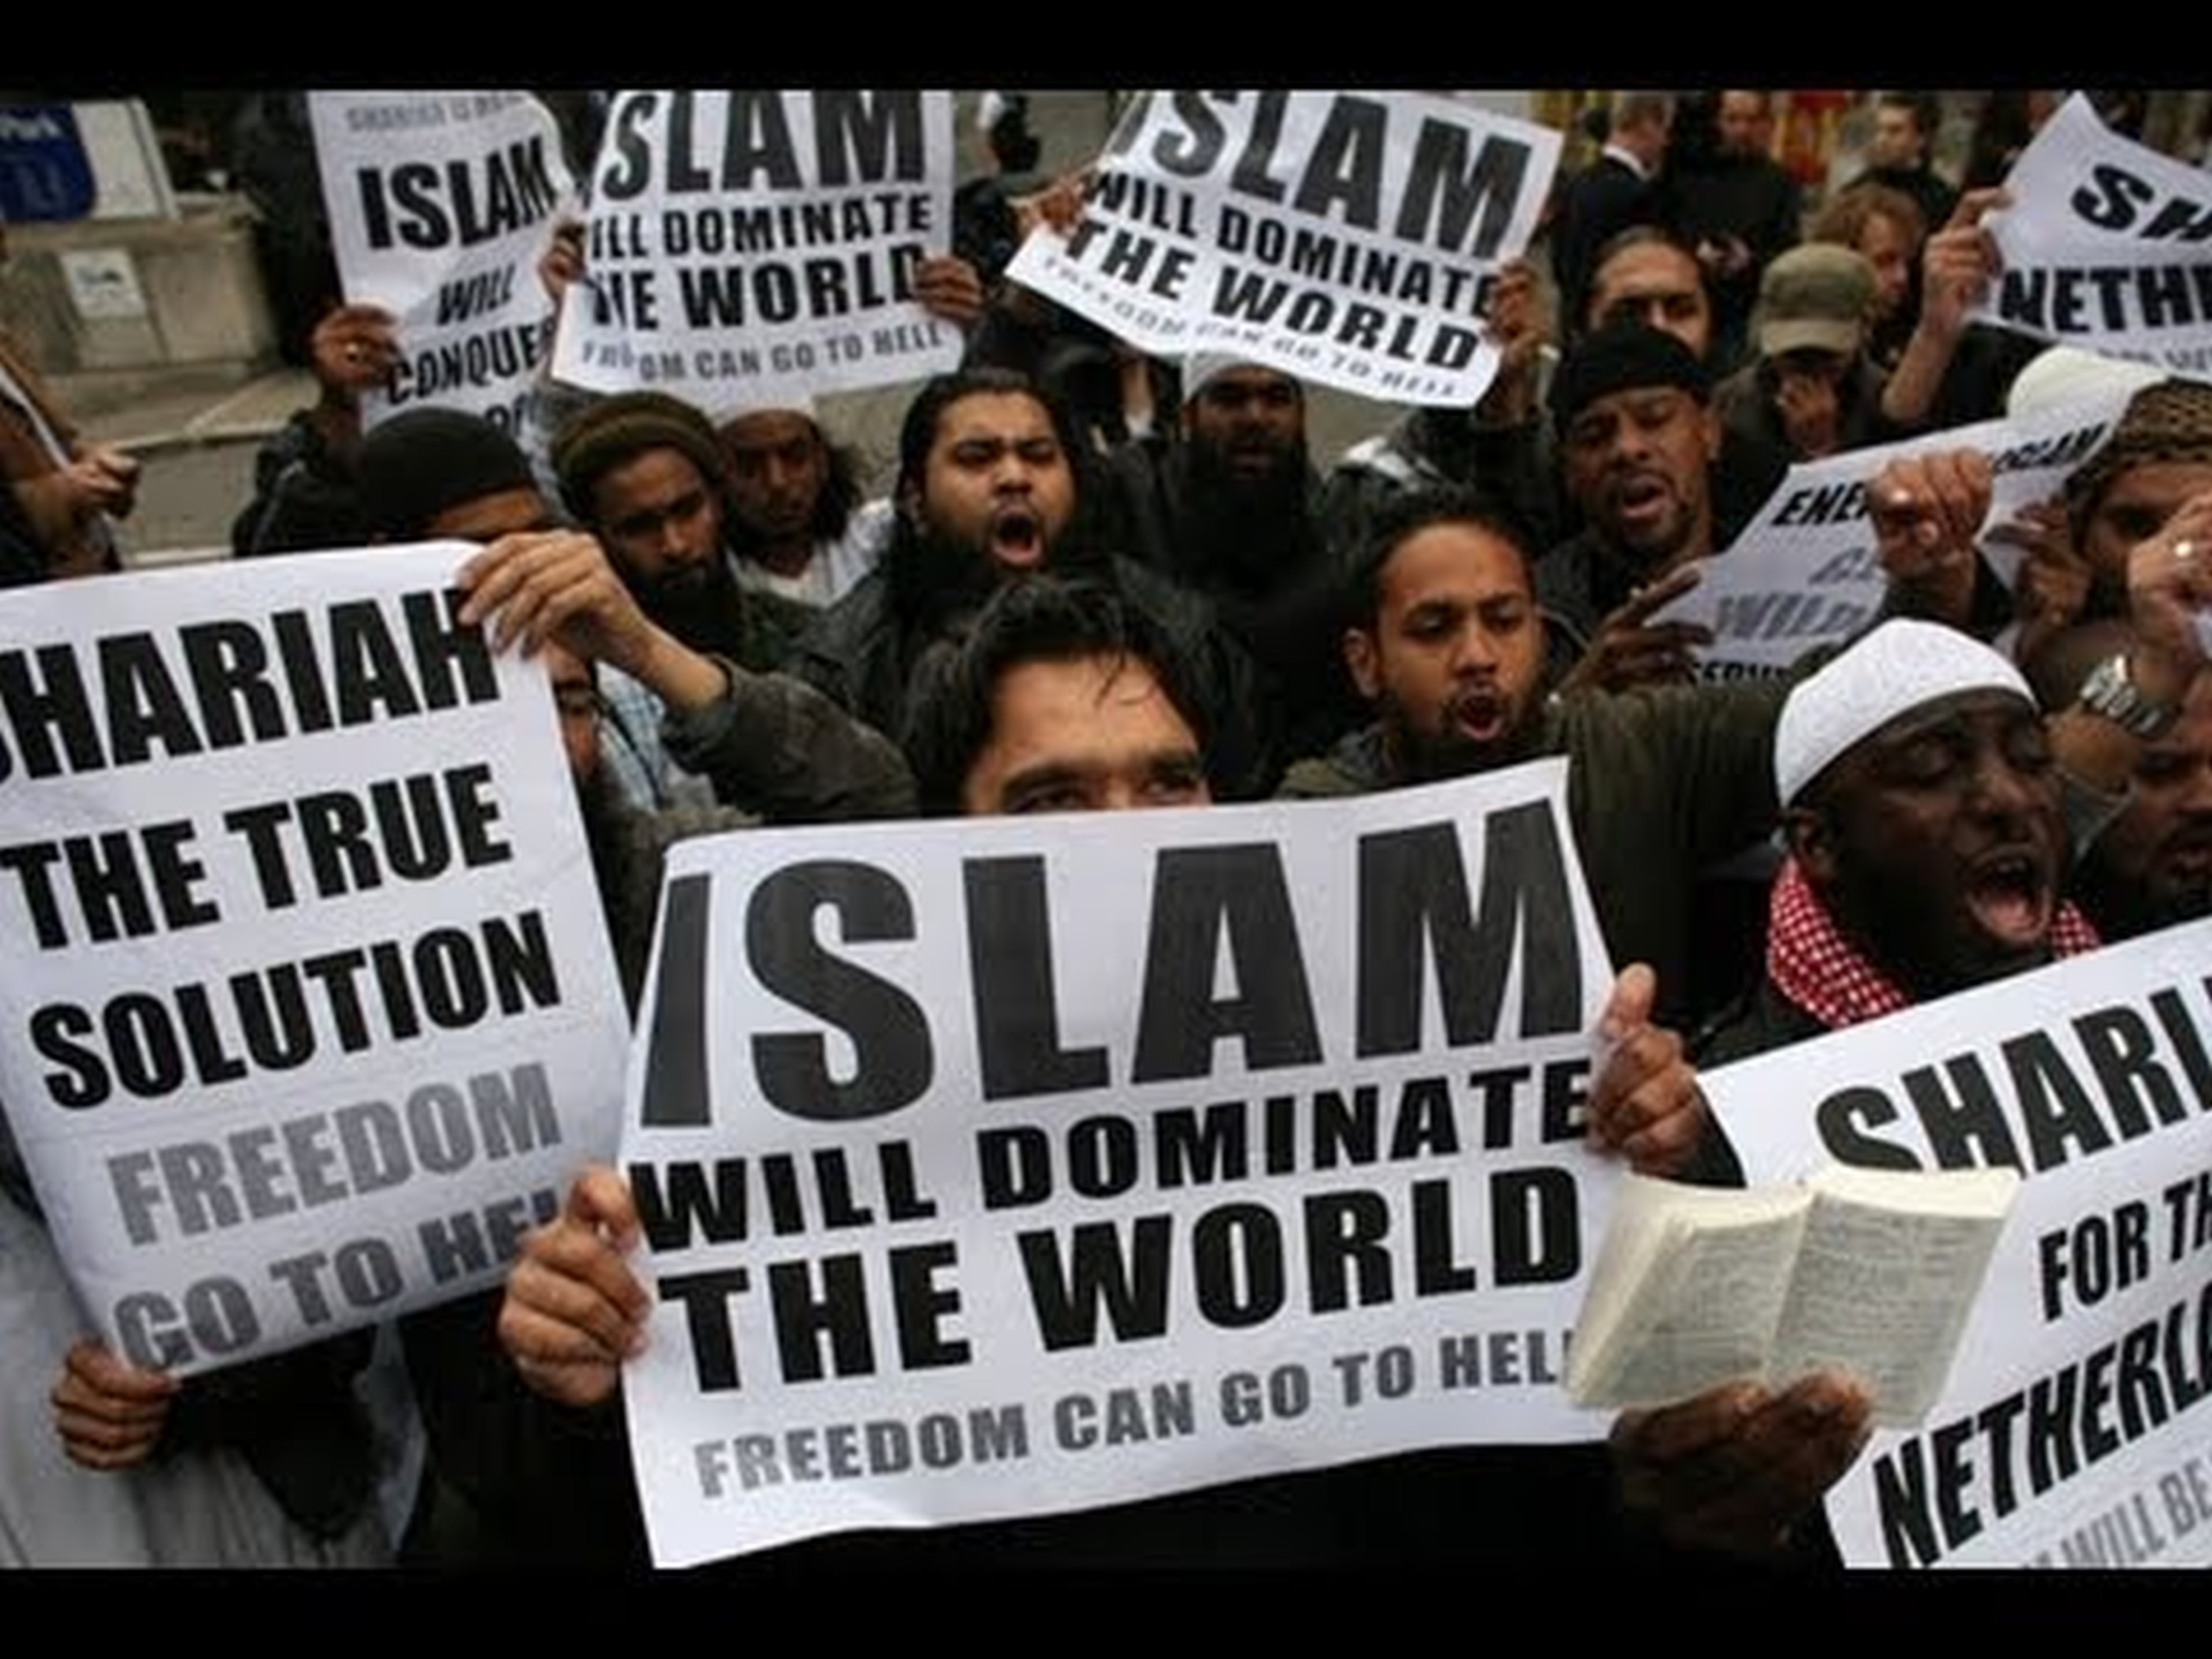 La guerra del Islam militante contra Occidente – Por Max Singer